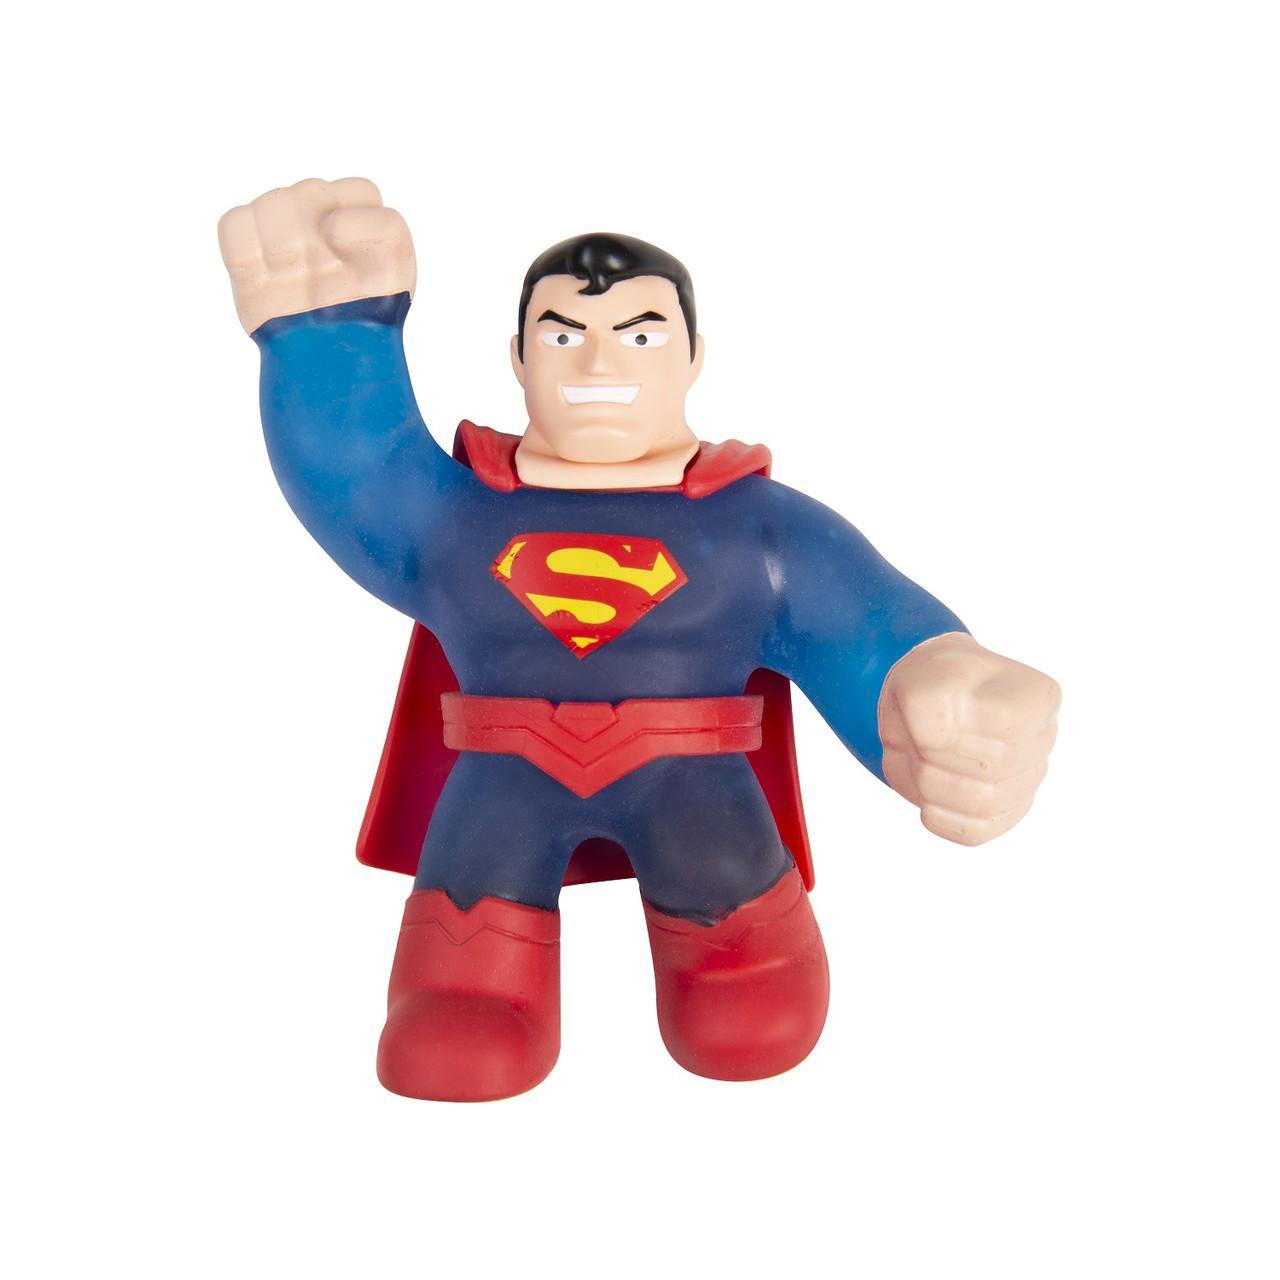 Гуджитсу Герои Тянущаяся фигурка Супермен